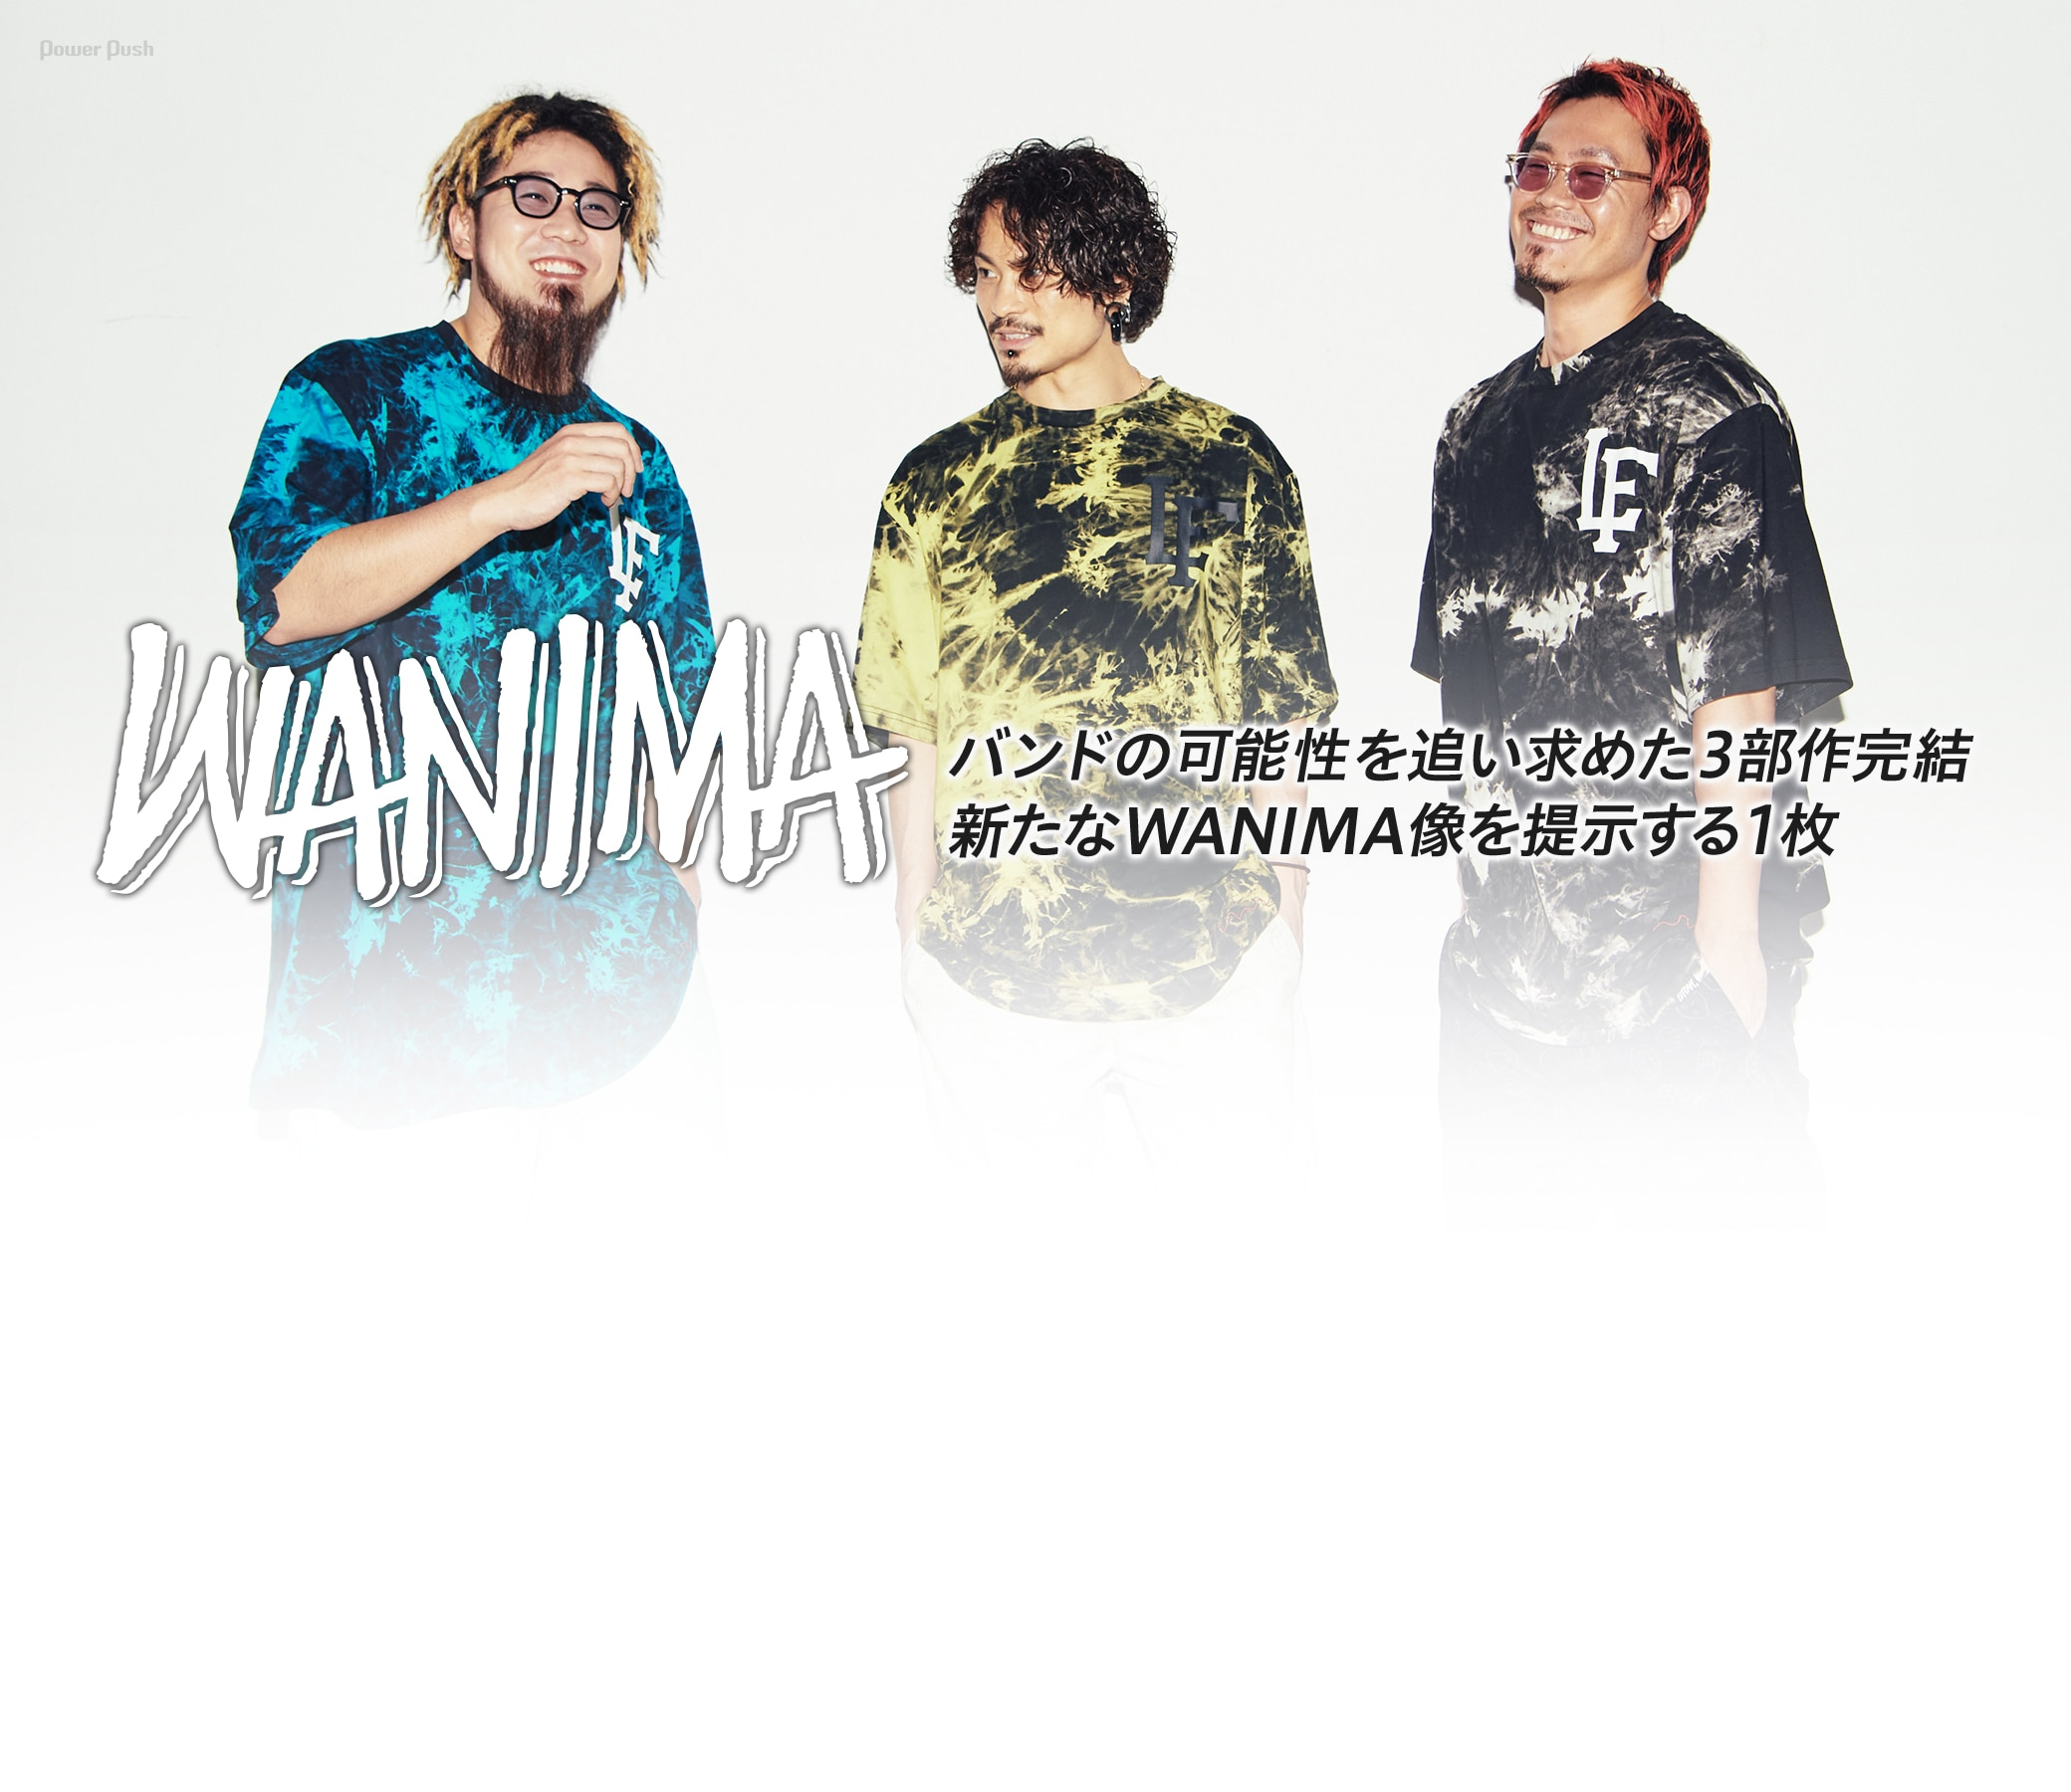 WANIMA|バンドの可能性を追い求めた3部作完結 新たなWANIMA像を提示する1枚